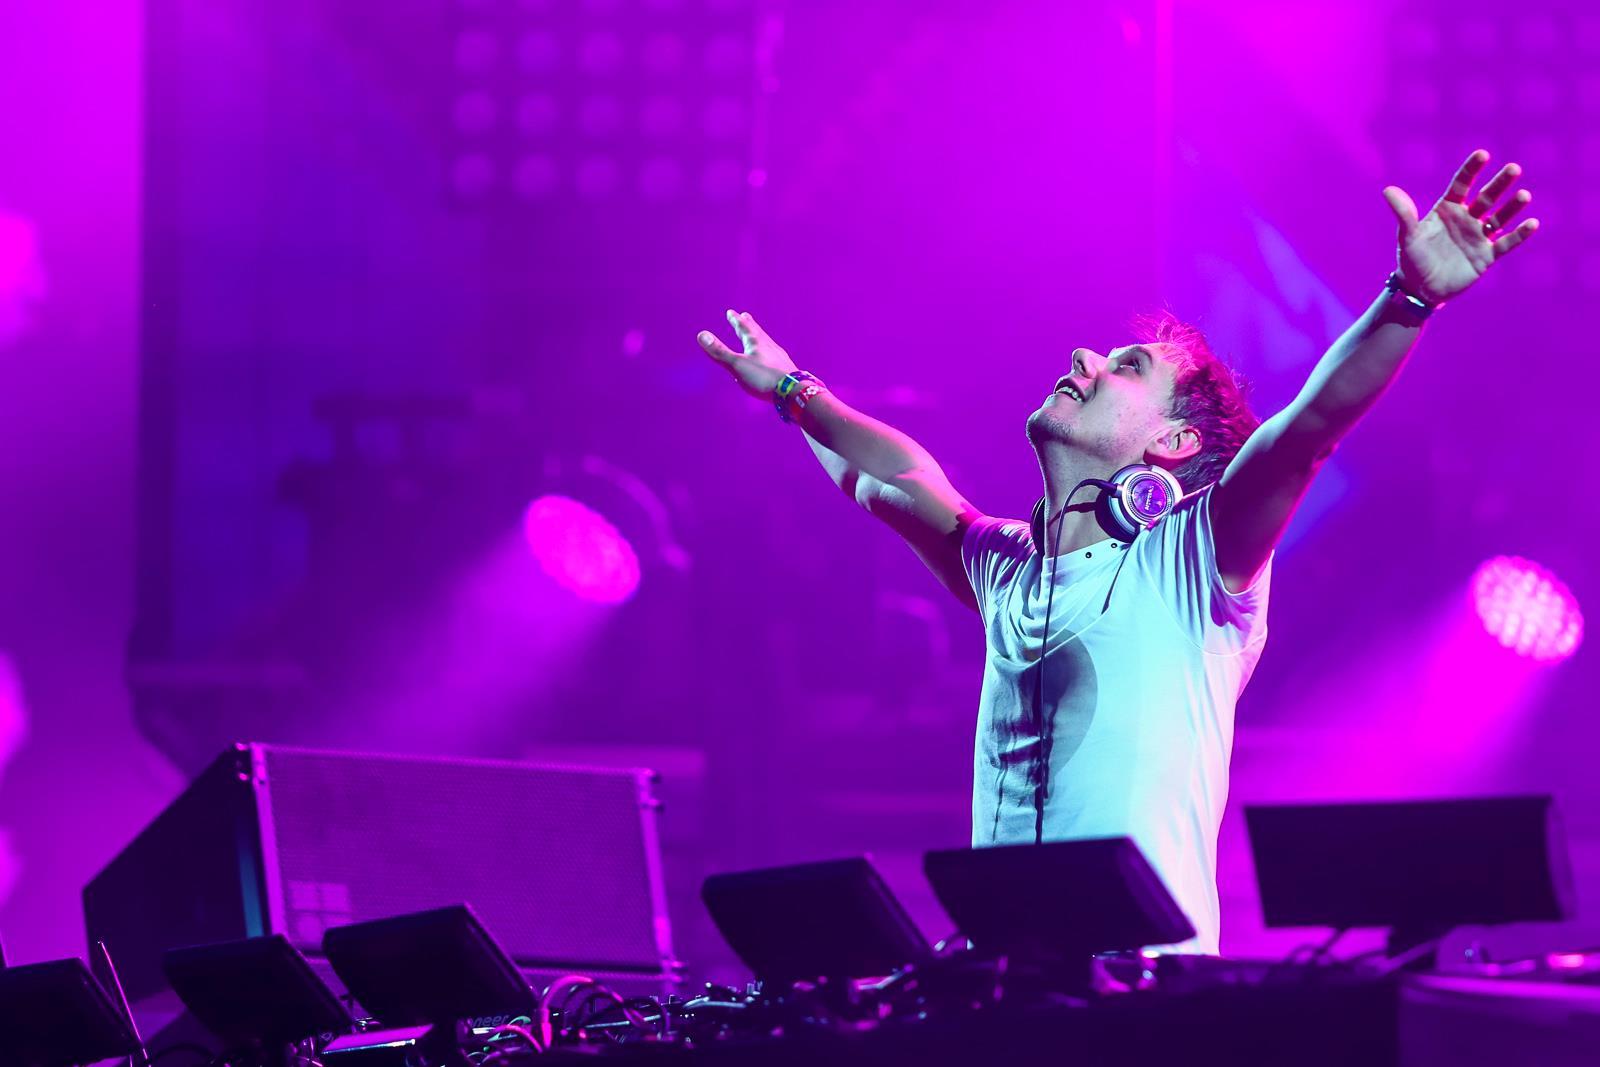 Armin Van Buuren Créditos: Reprodução internet